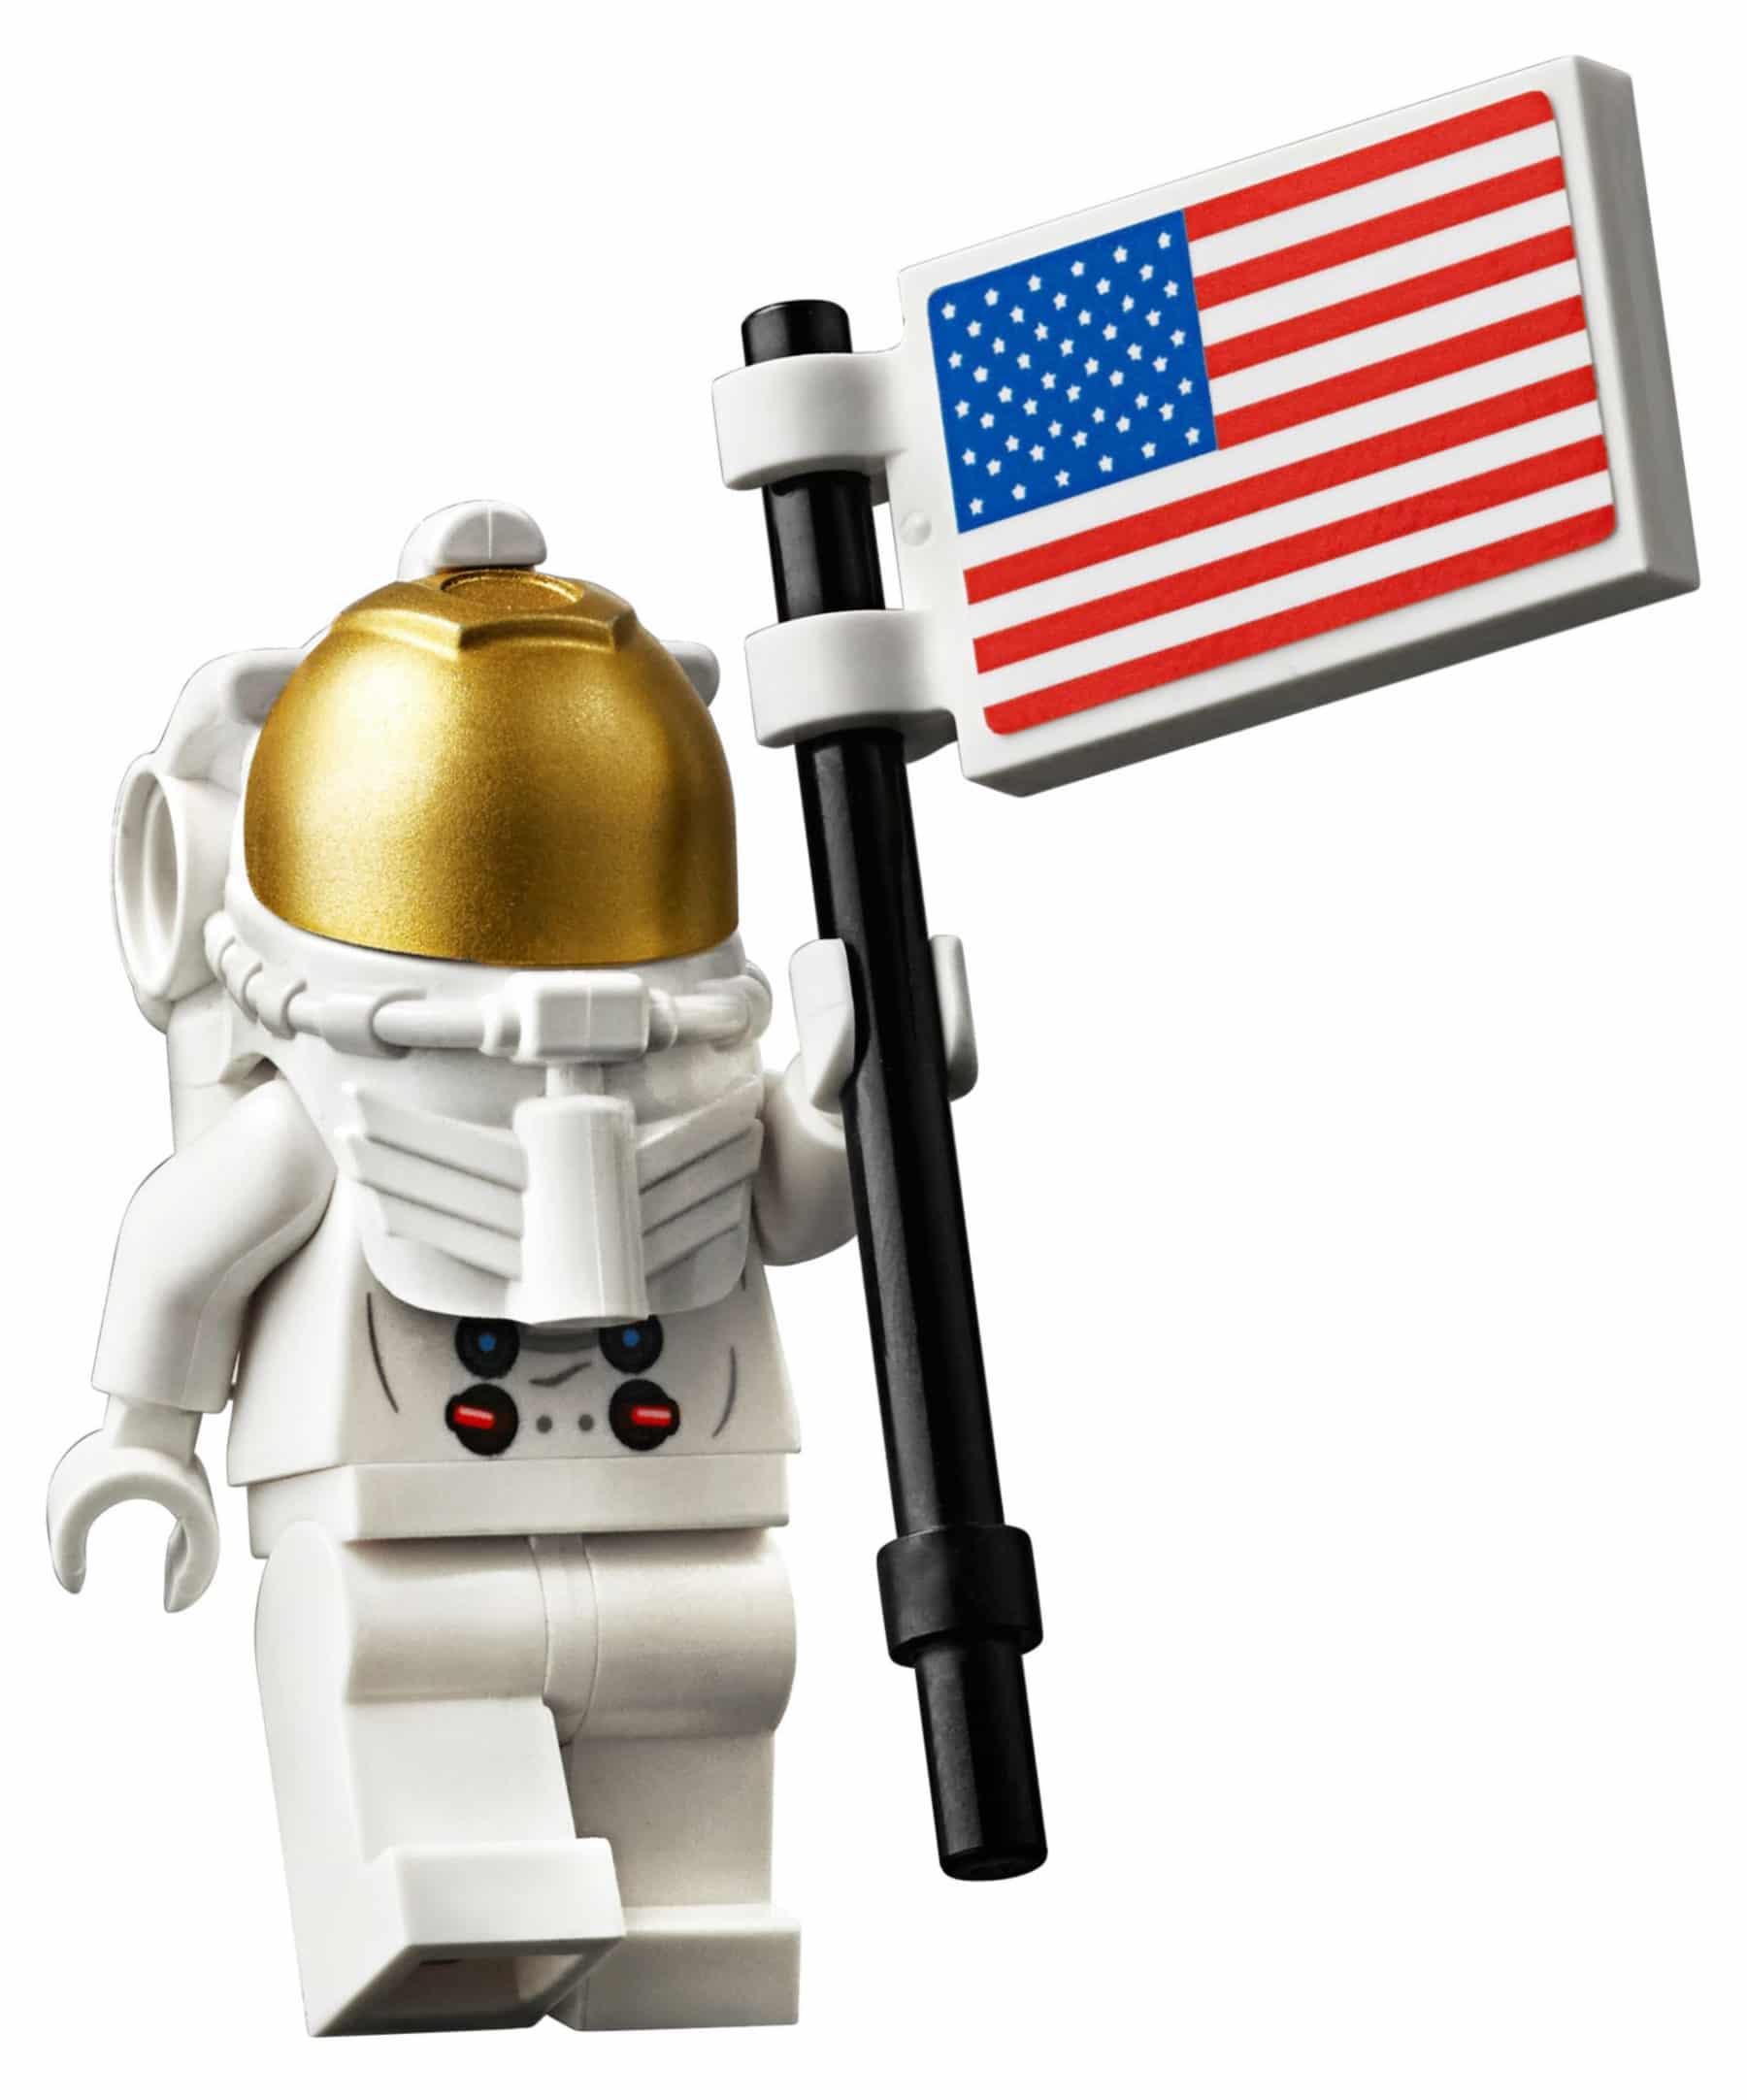 LEGO 10266 NASA Apollo 11 Mondlandefähre Astronauten